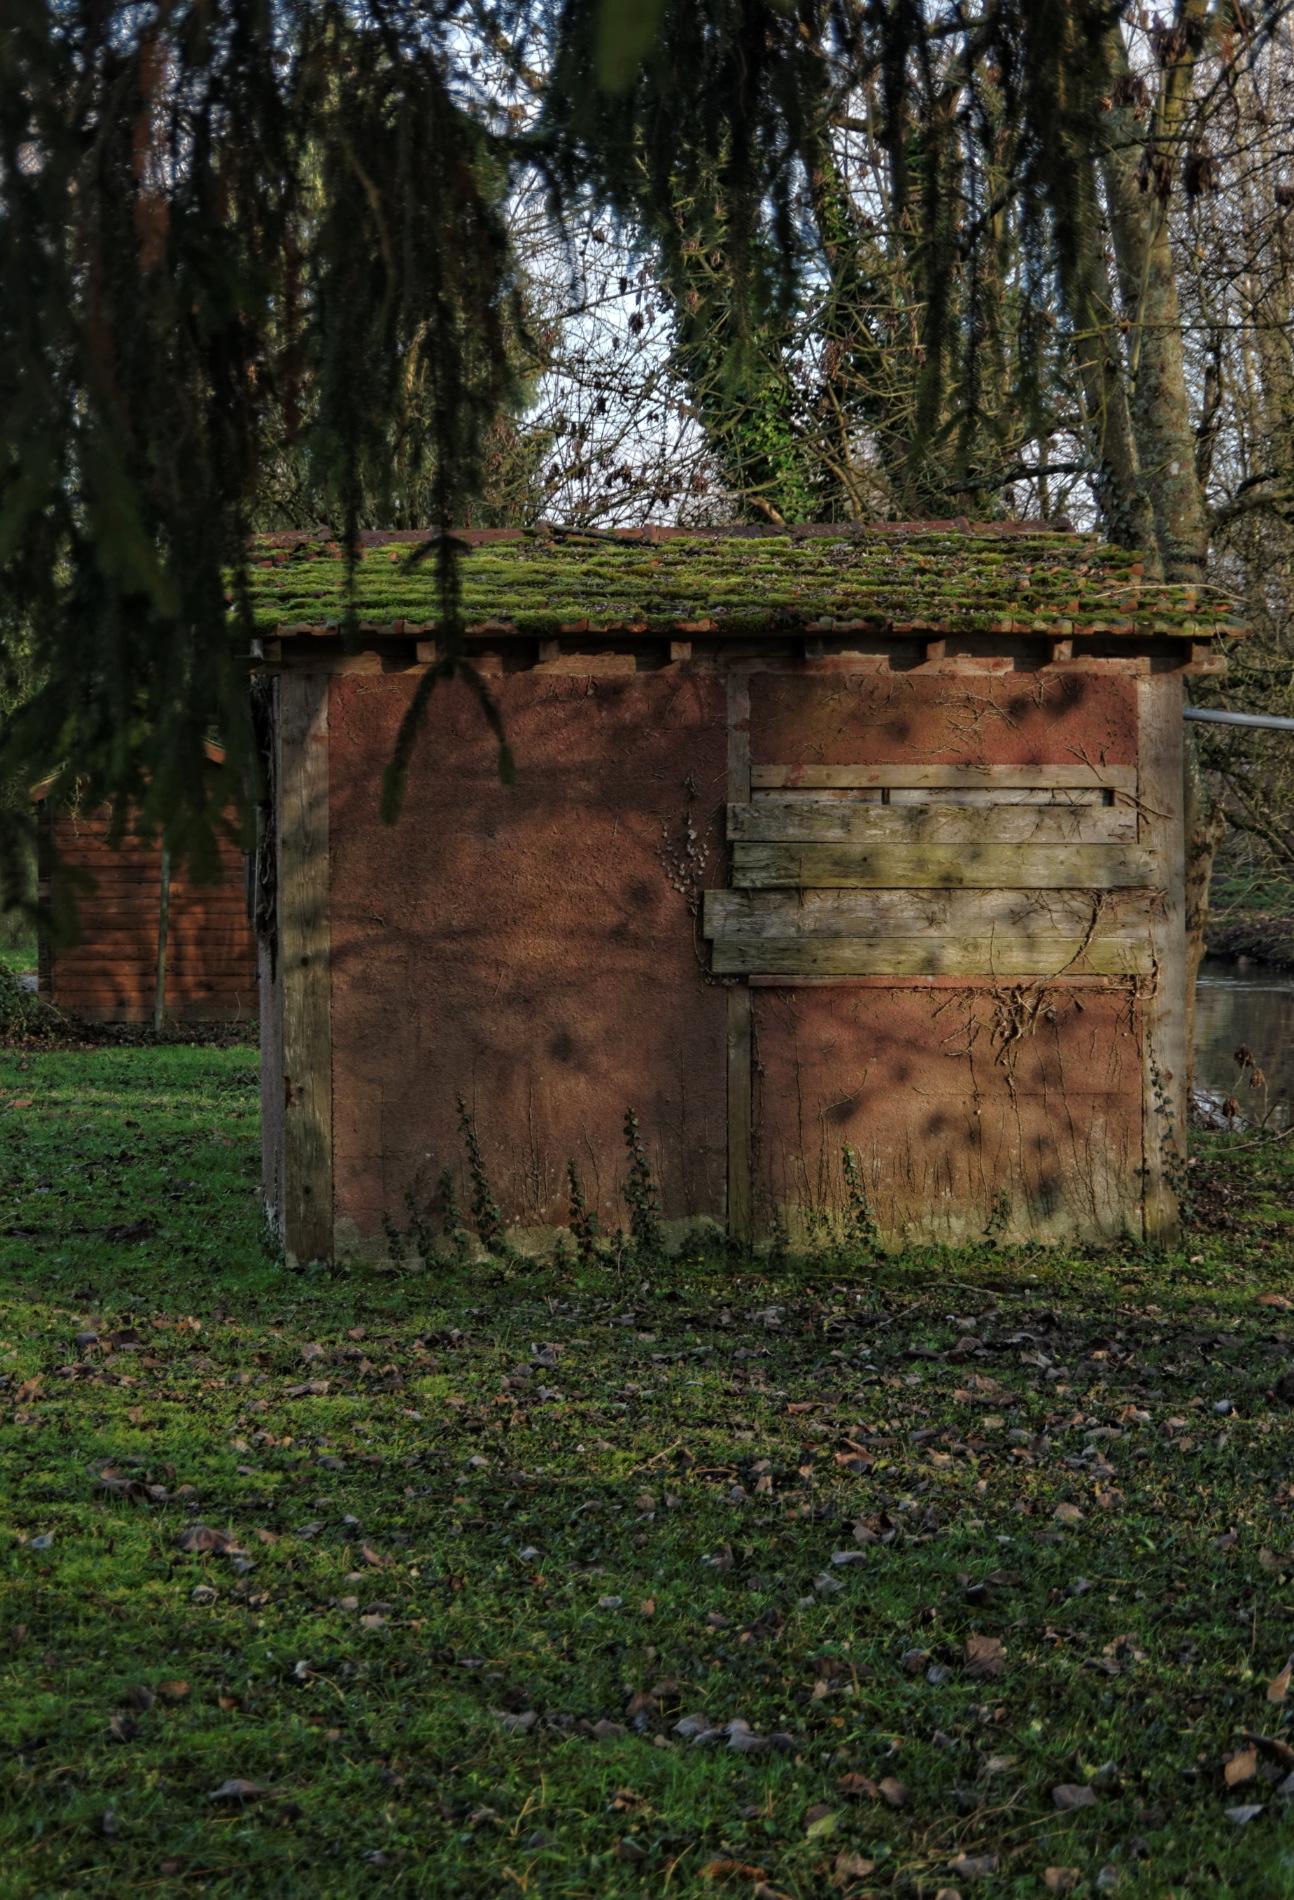 cabanes jardin, jardin portager, Etampes, bois de Valnay, Marais de Vaujouan, photos,